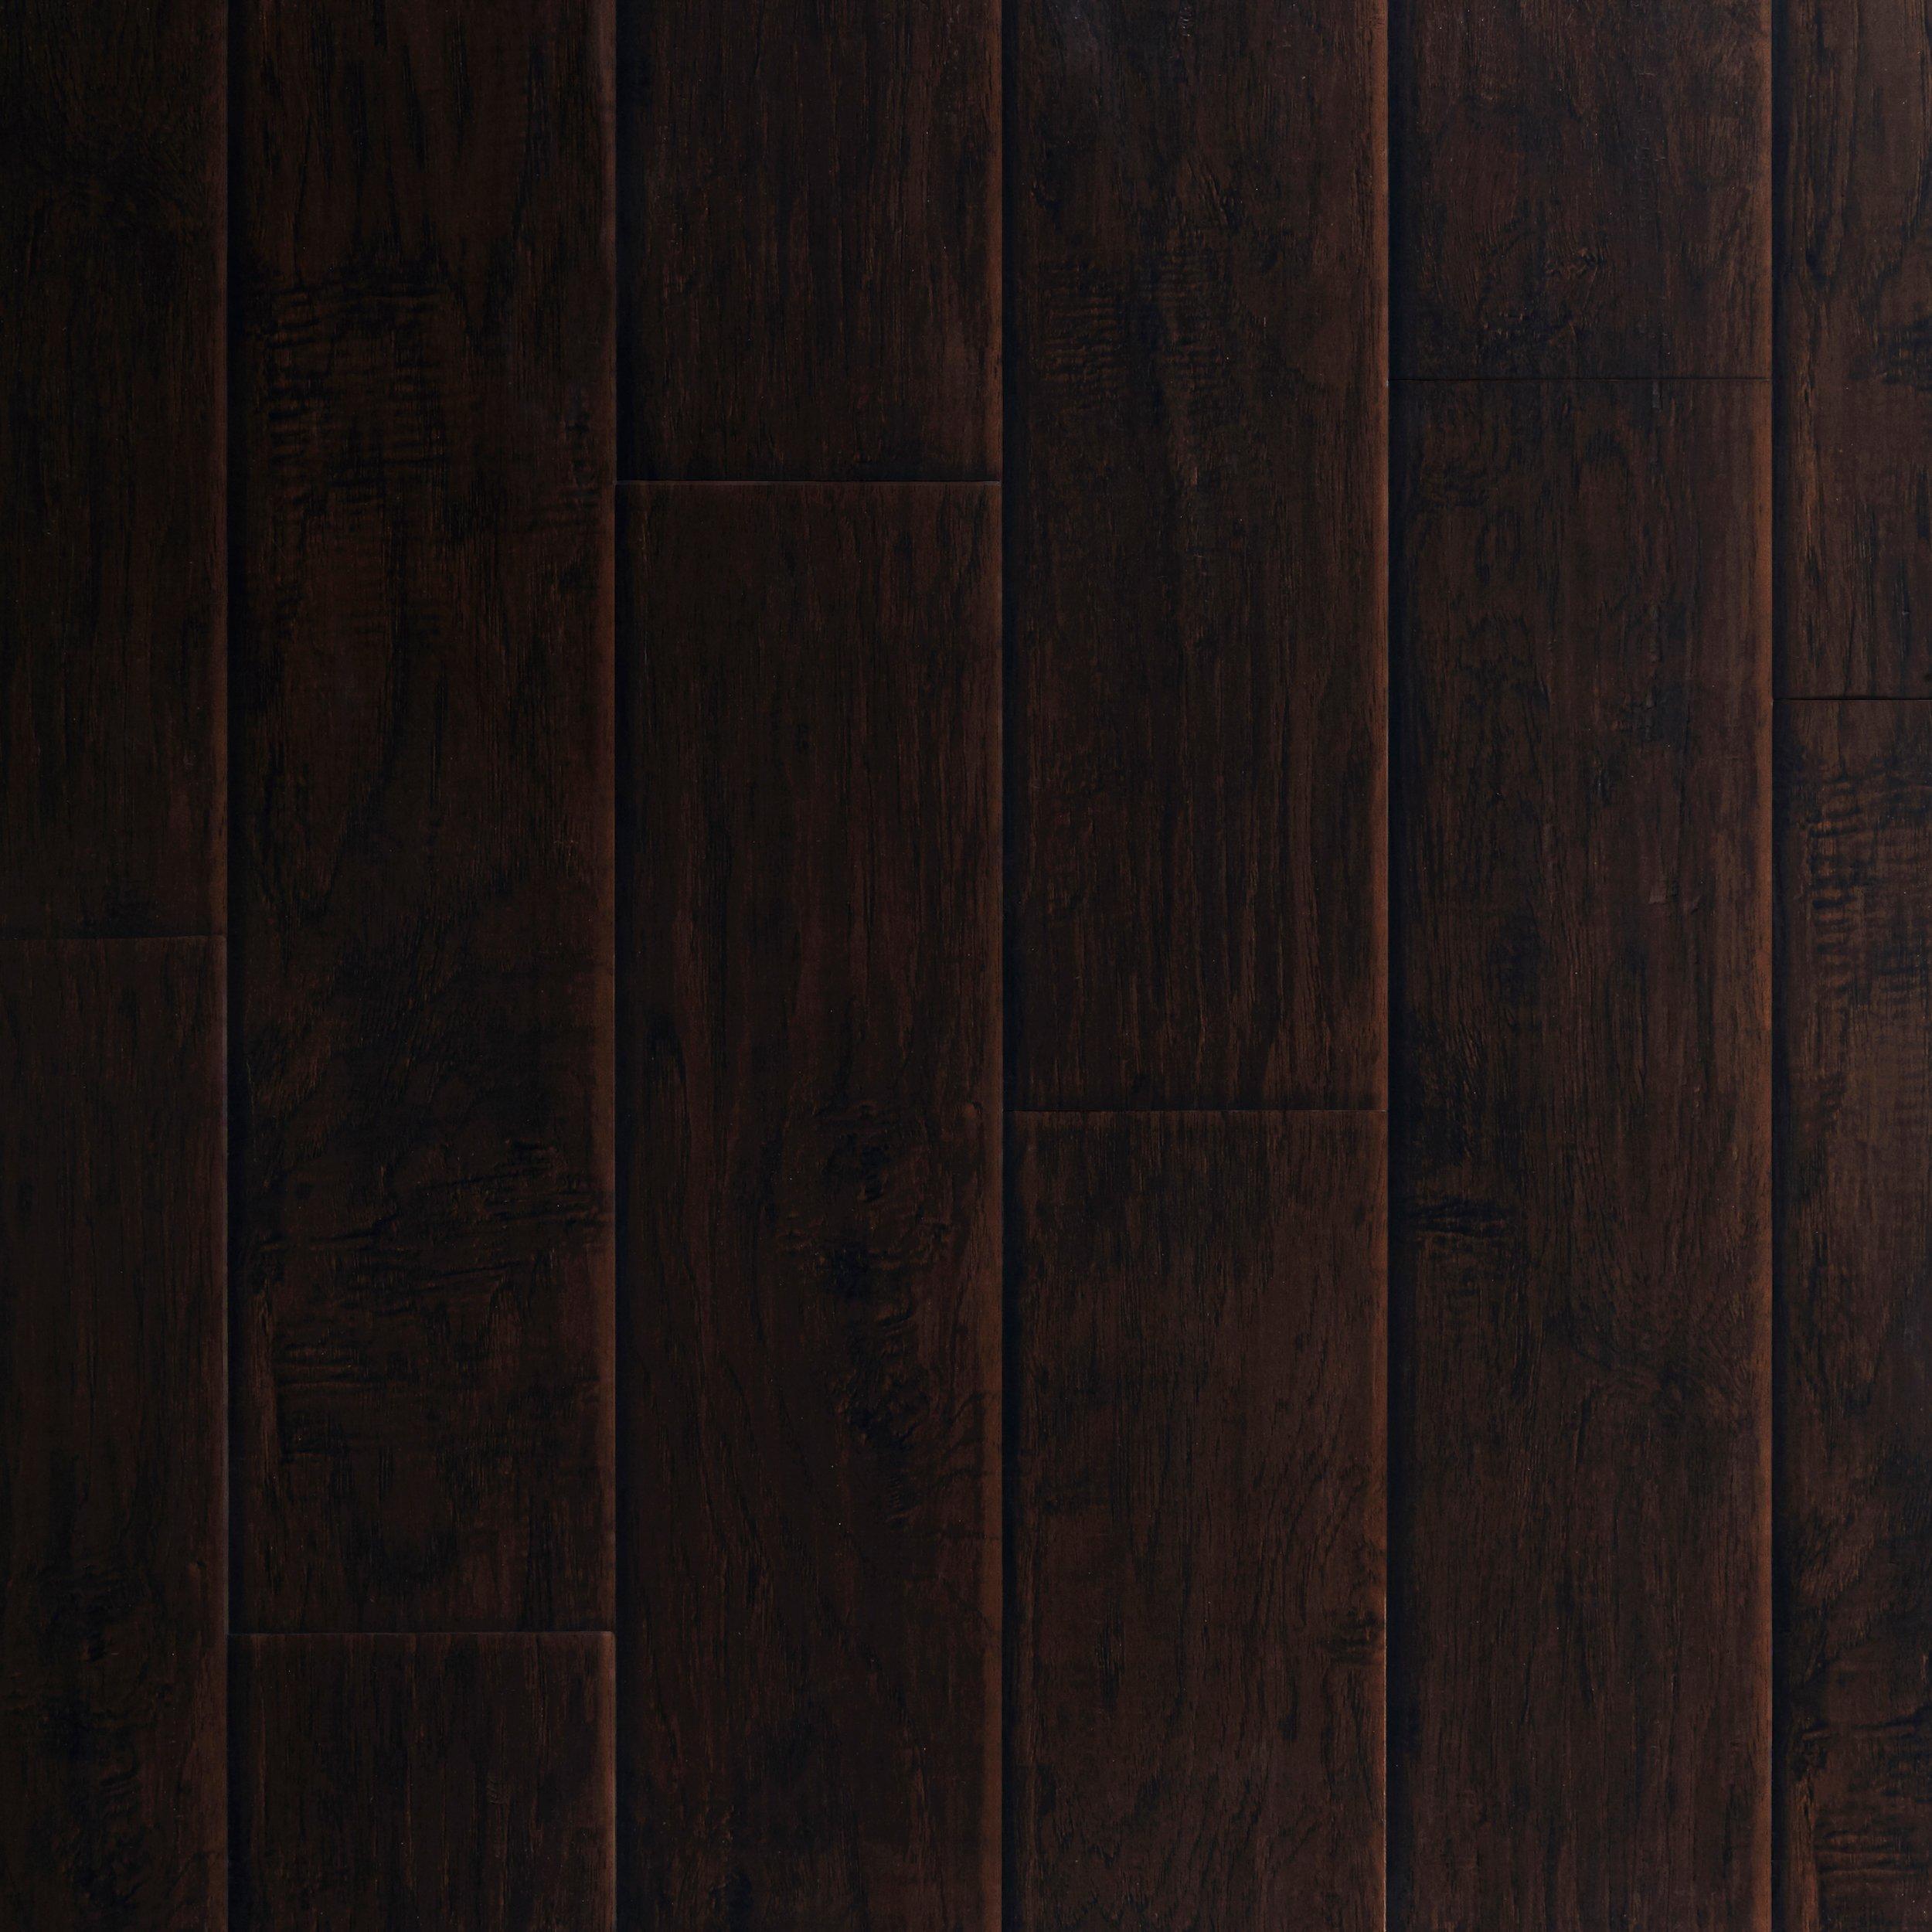 Dark Hampton Hickory Hand Scraped Luxury Vinyl Plank 42mm